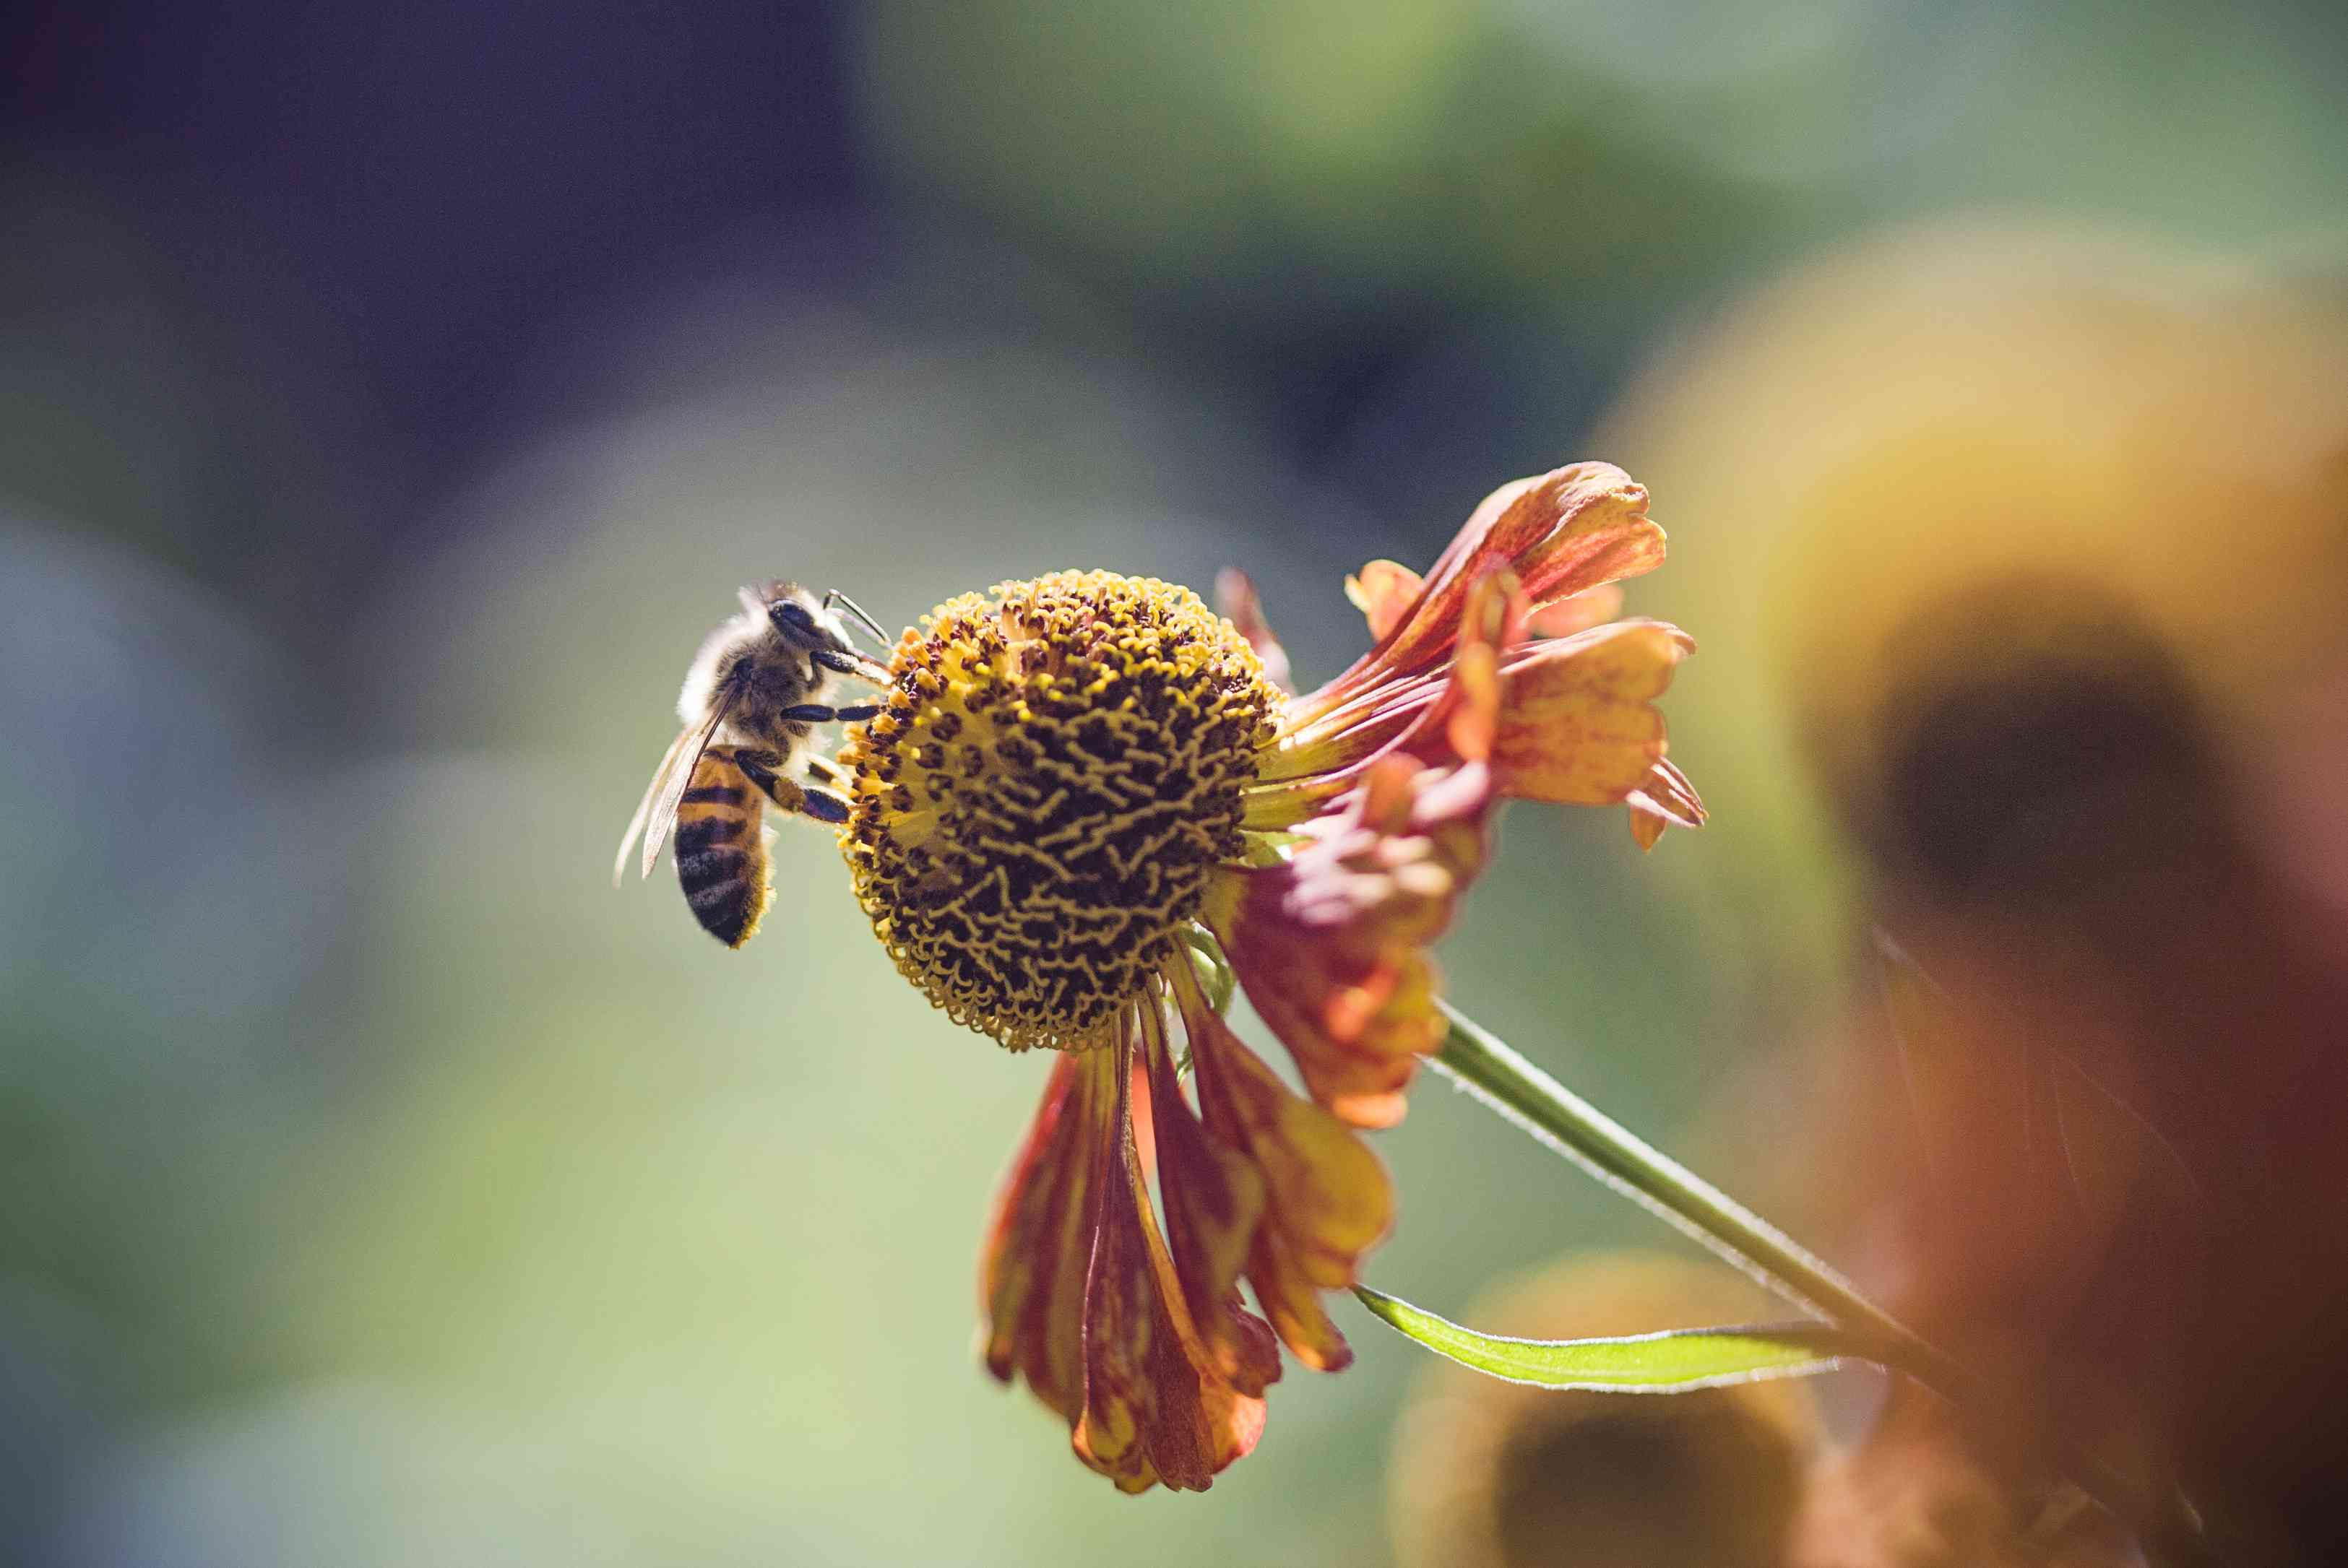 Honeybee collecting pollen from a flower.